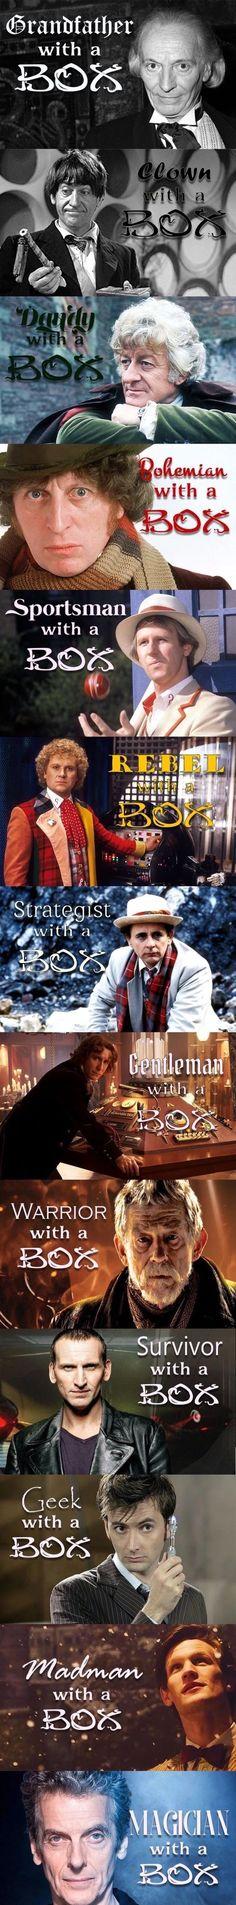 Doctor Who Themed Postcard Idris #1 NEW